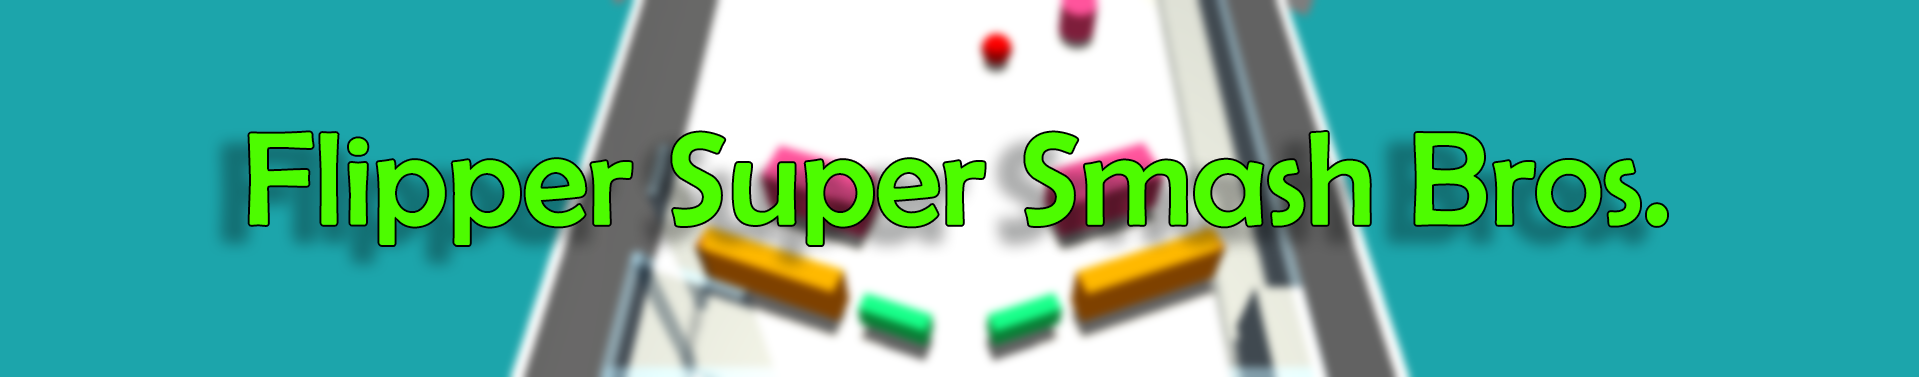 Flipper Super Smash Bros